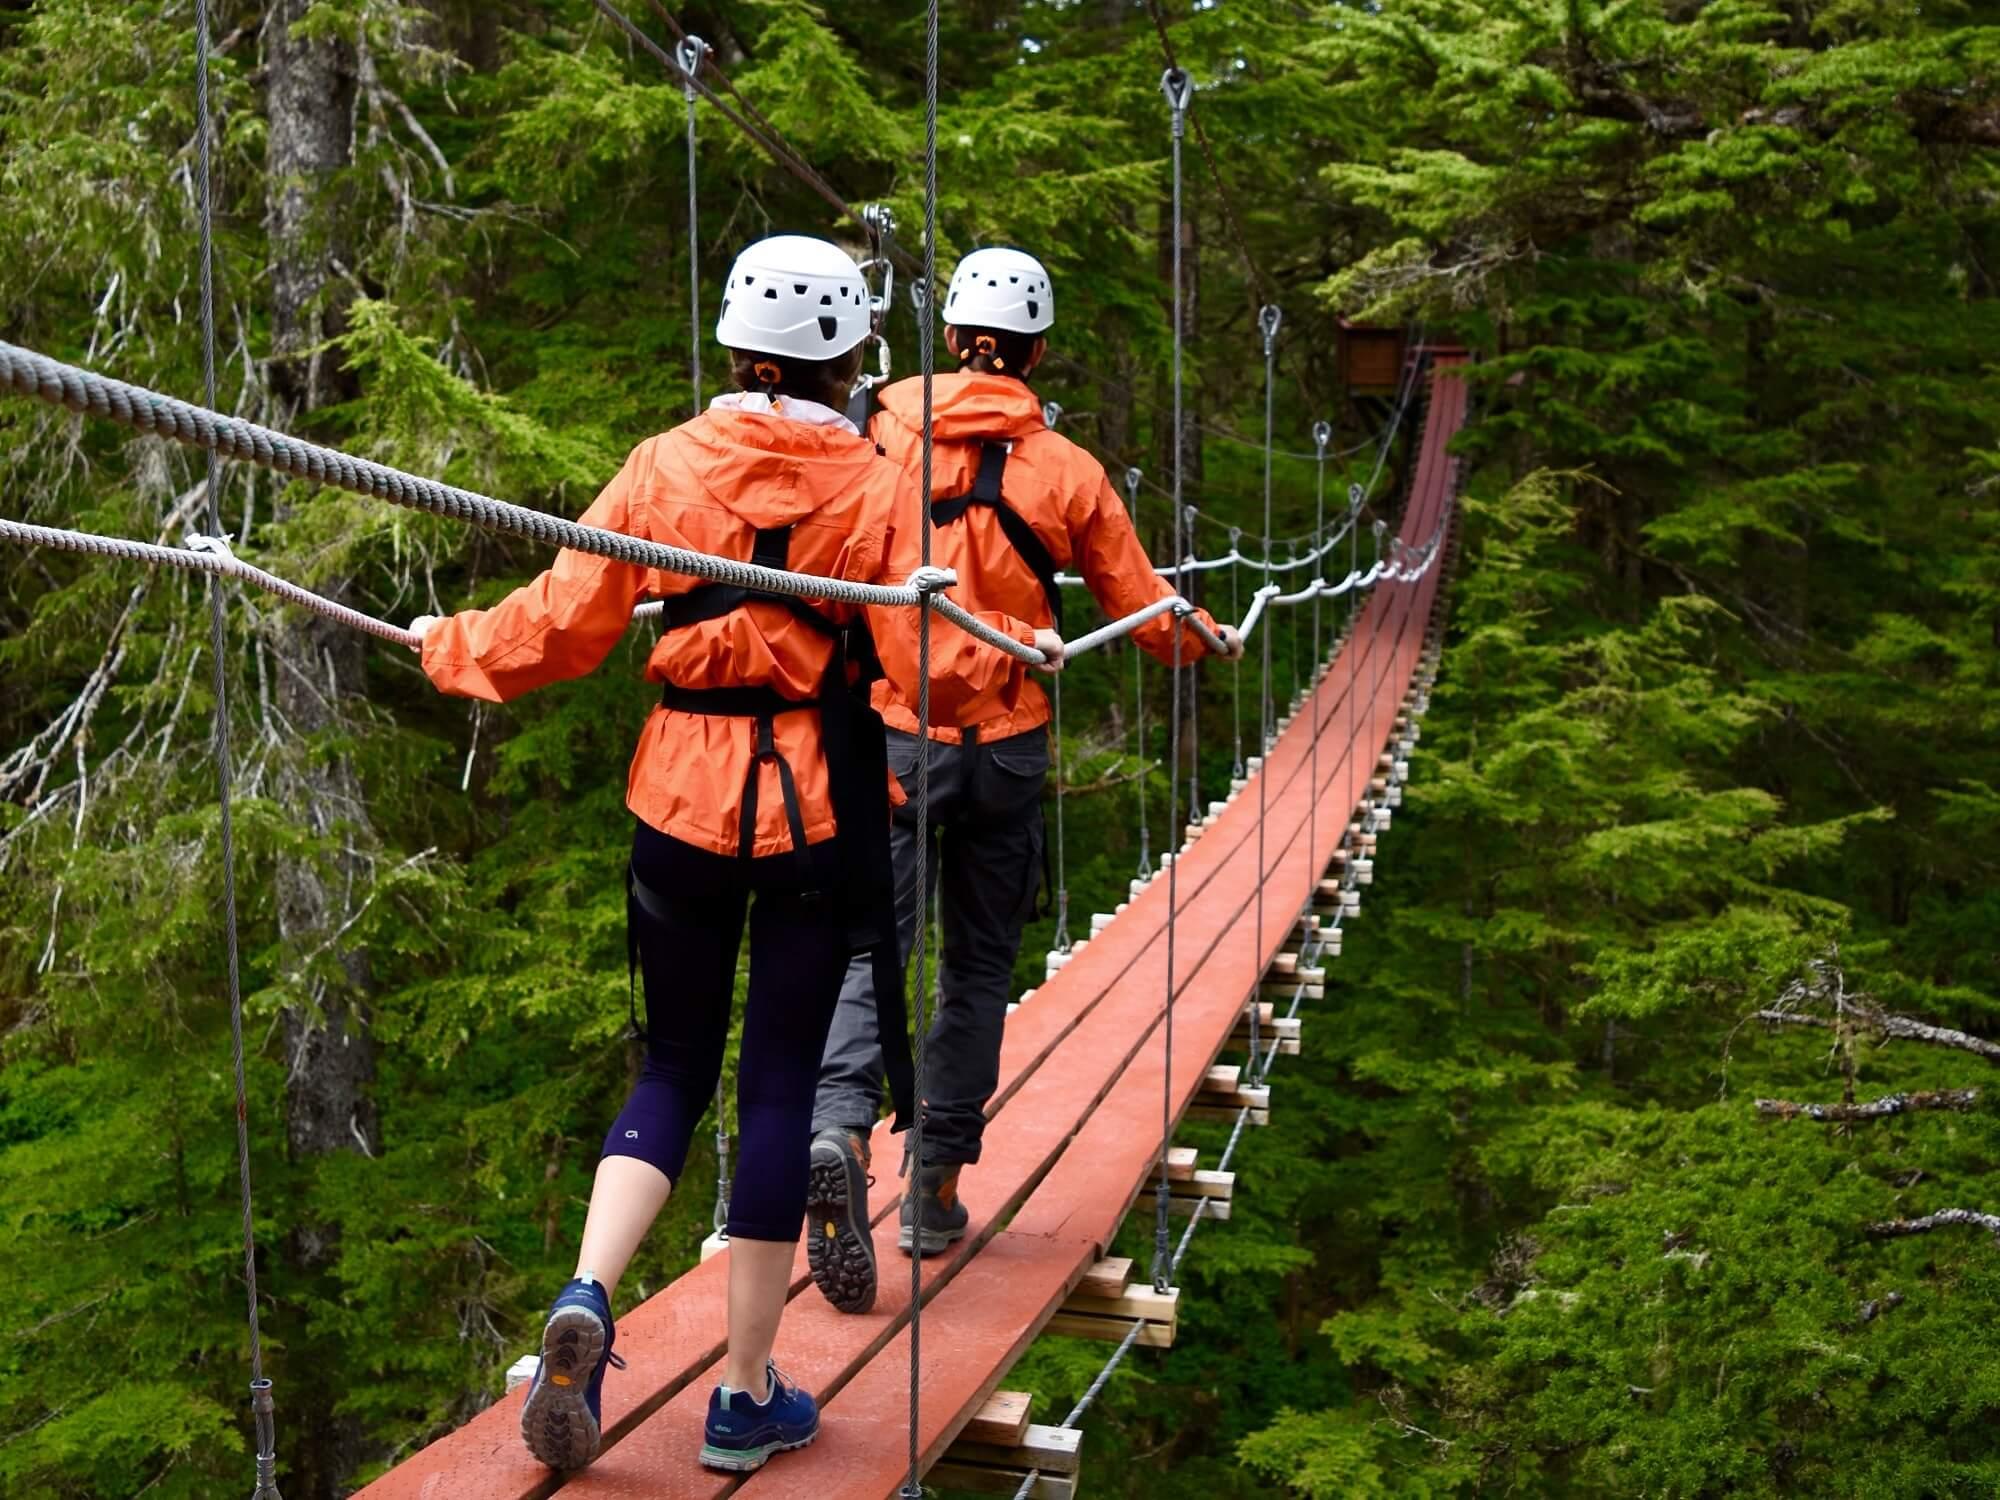 https://www.kawanti.com/wp-content/uploads/2018/10/Juneau-zip-bridge.jpg